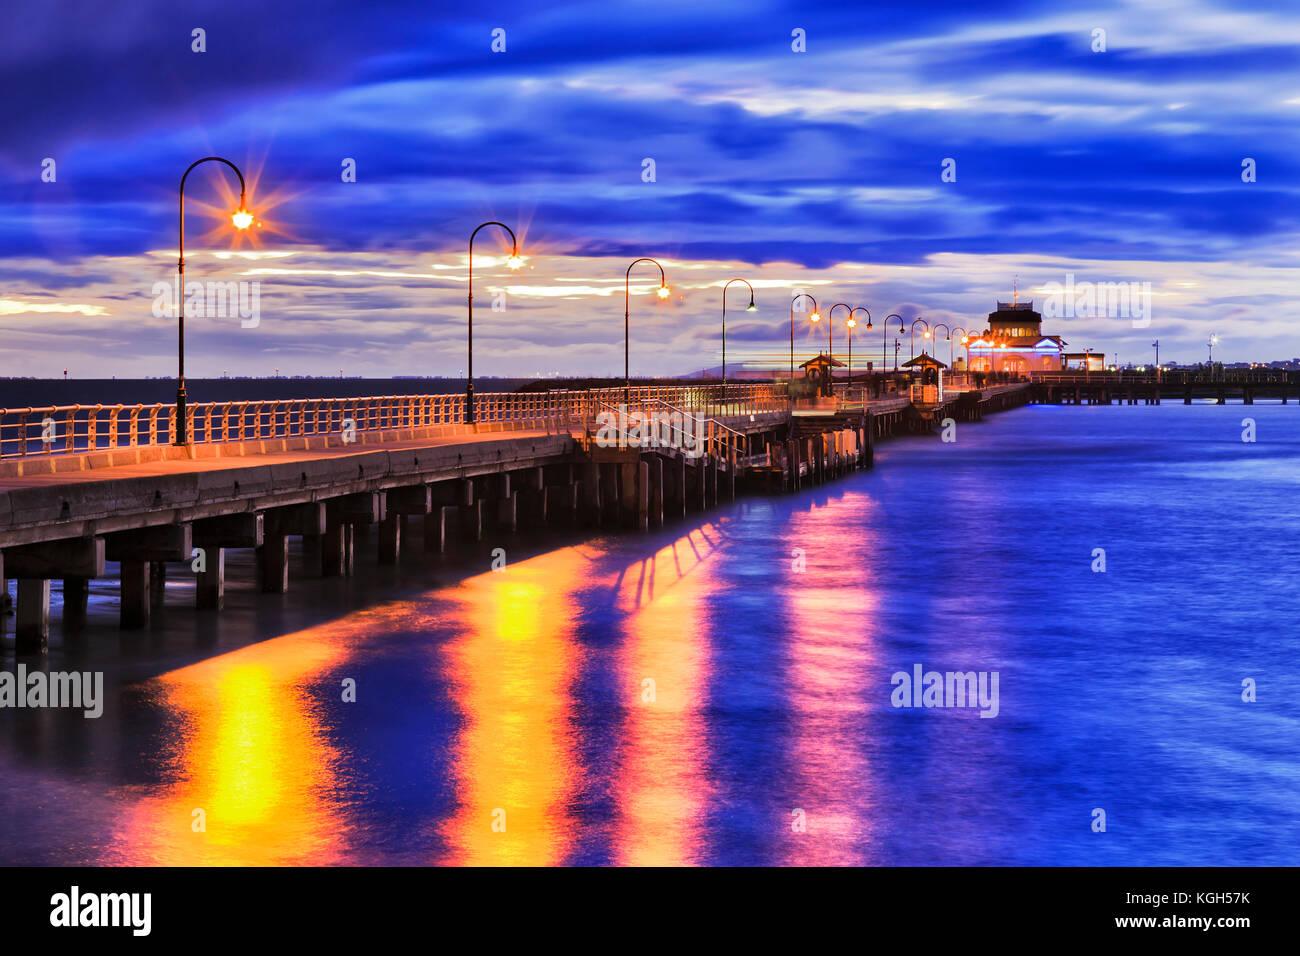 Stormy sunset at Port Philip bay around St Kilda beach historic timber Jetty with street light illumination reflecting - Stock Image